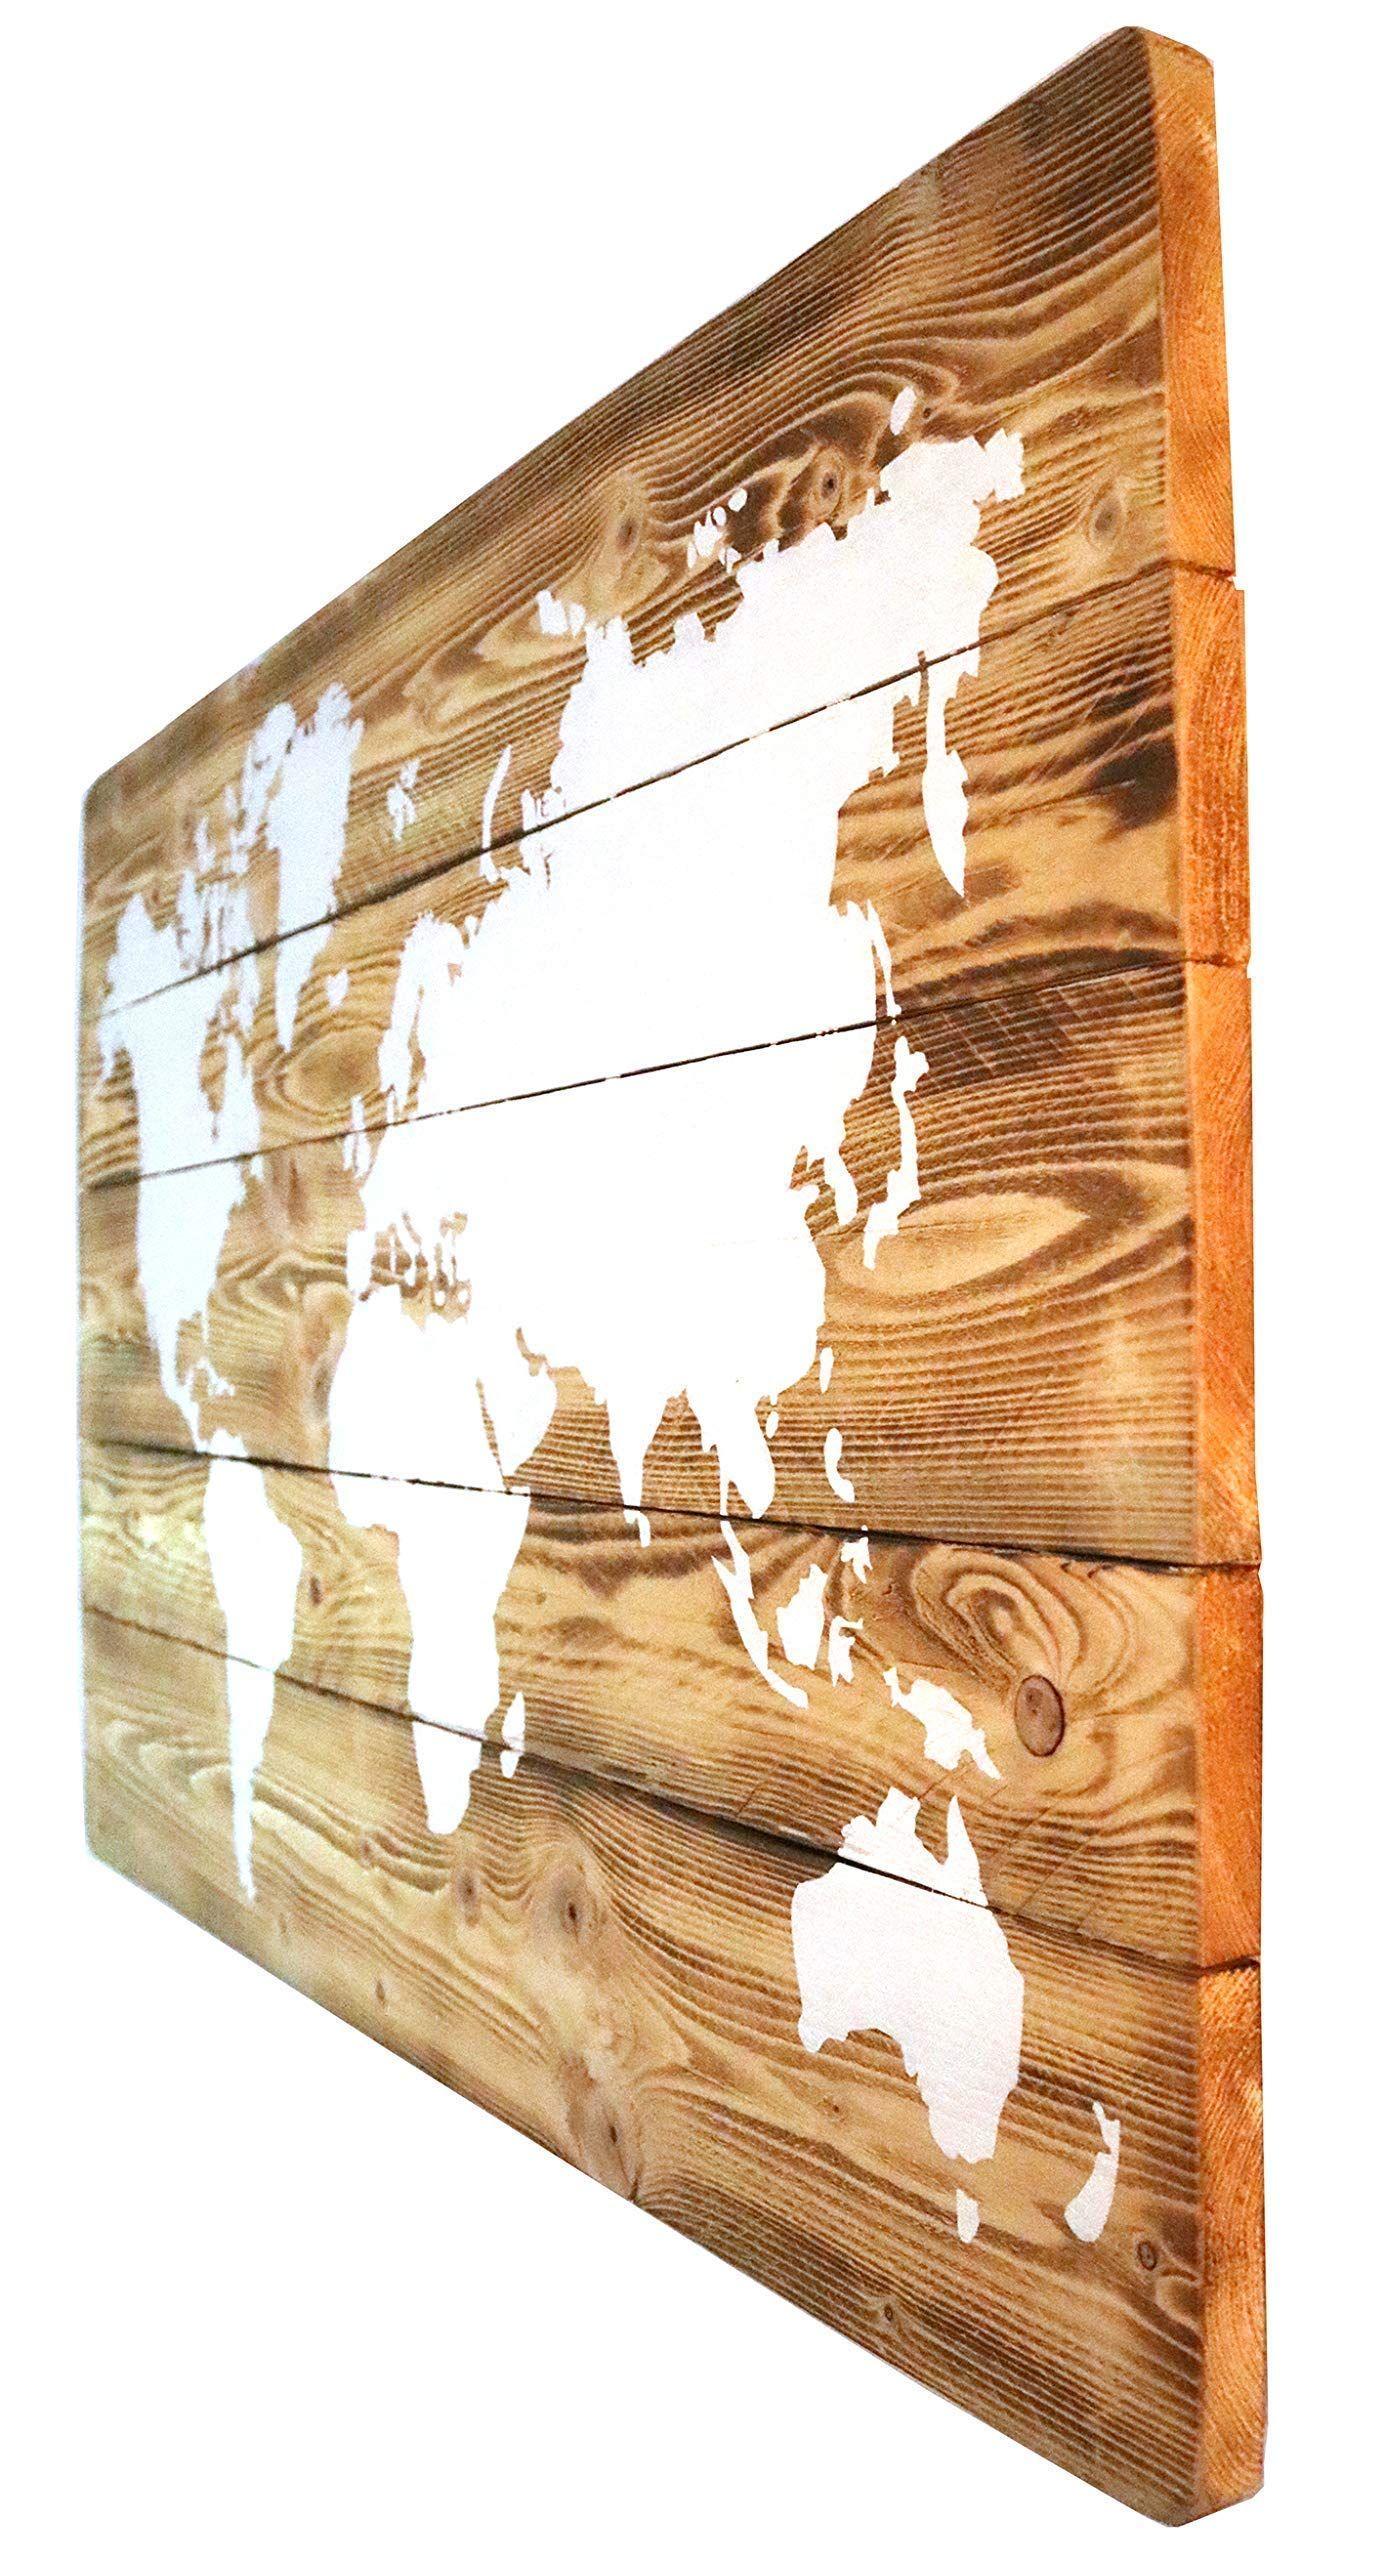 Weltkarte Auf Holz Mit Led Beleuchtung Optional Wandbild Handgefertigt Rustikal Wei E Kreidefarbe L Ndlich Stimmungsli Vintage Deko Rustikal Weiss Kreidefarbe